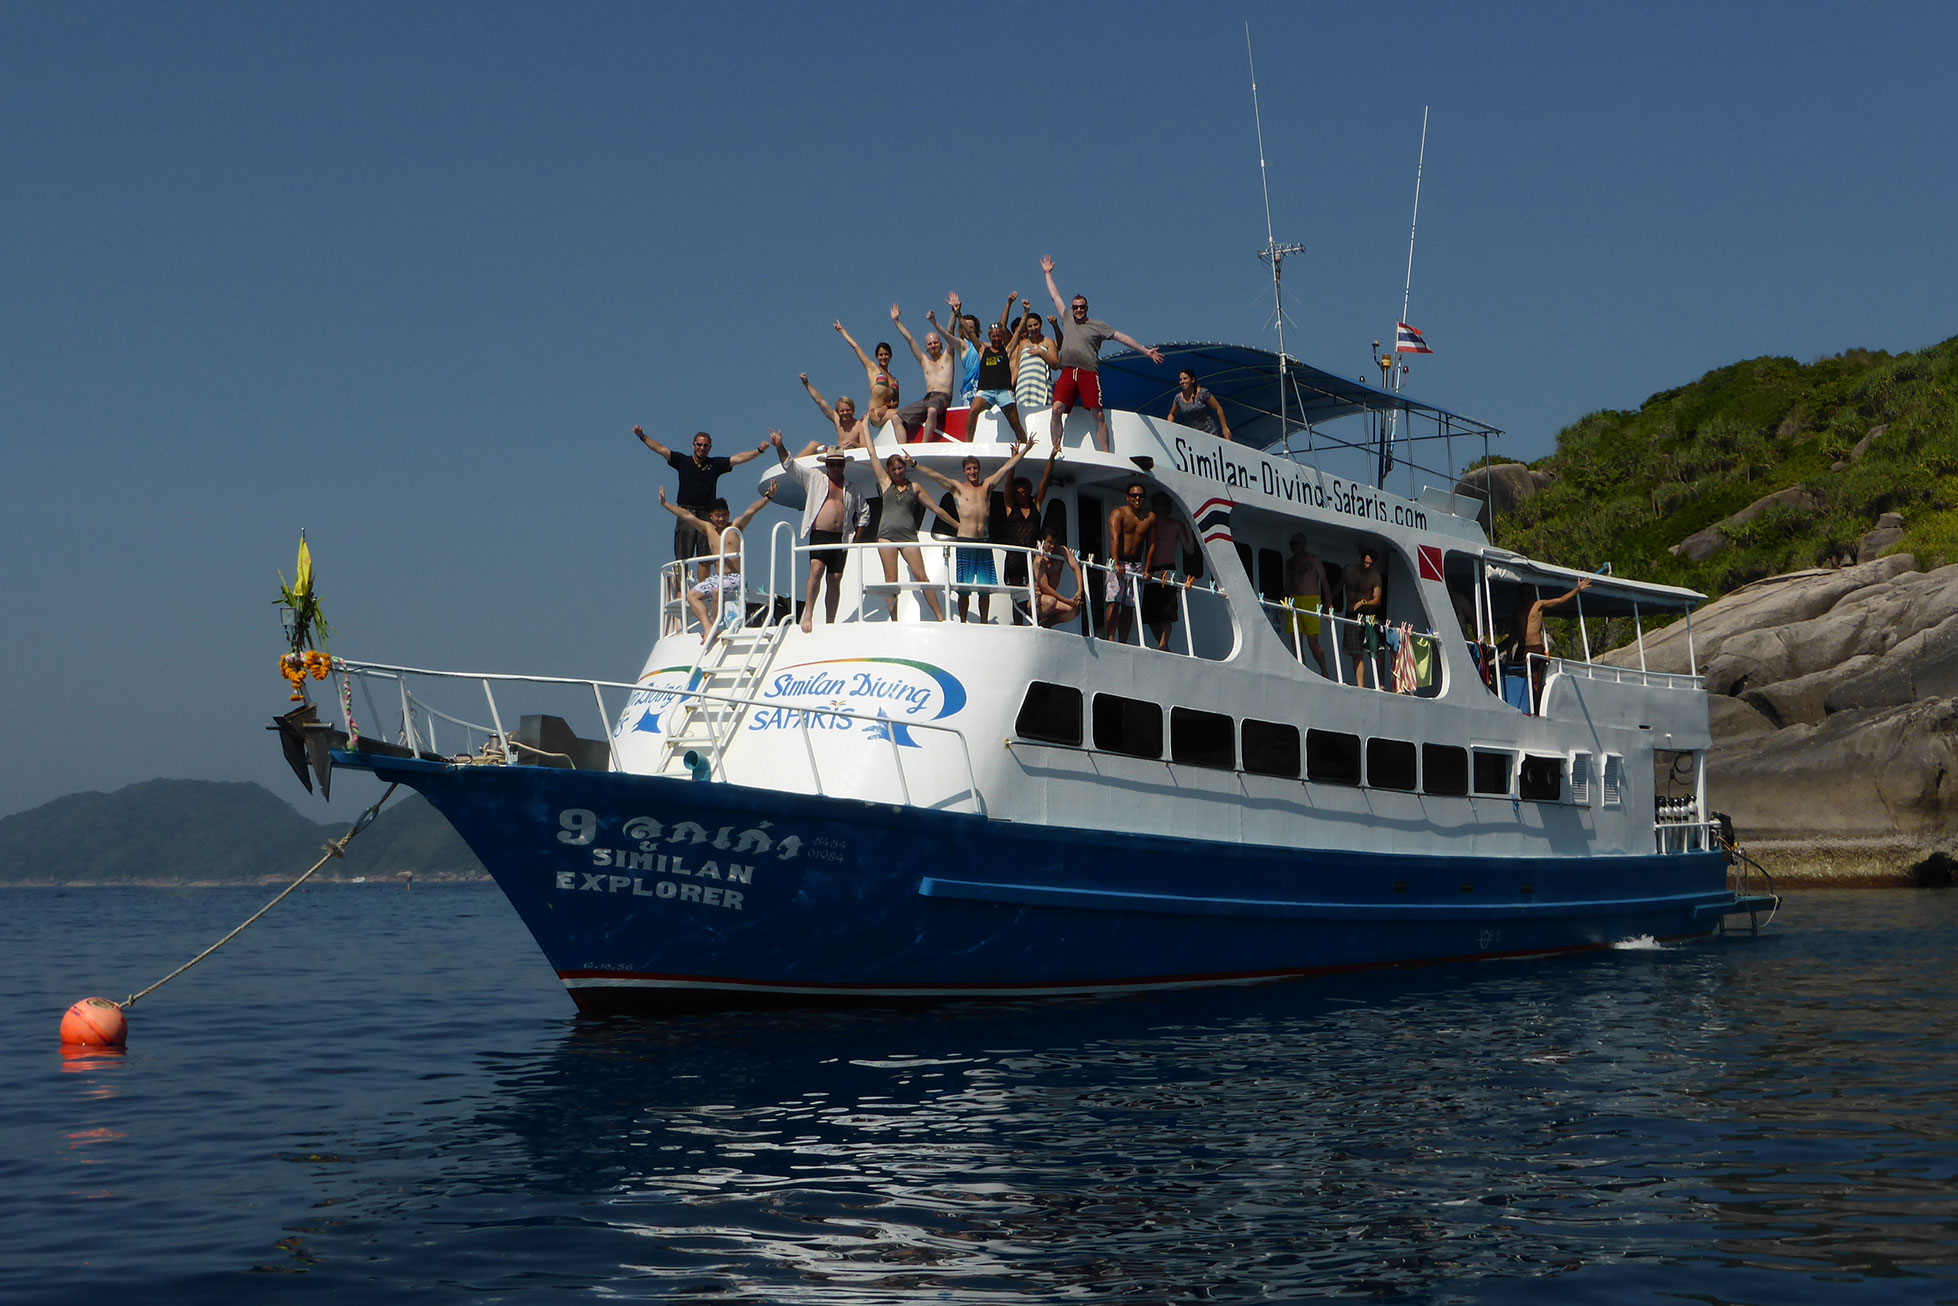 Similan Explorer Tauchsafari Khao Lak Similan Islands Koh Bon Koh Tachai Richelieu Rock Tauchen Thailand